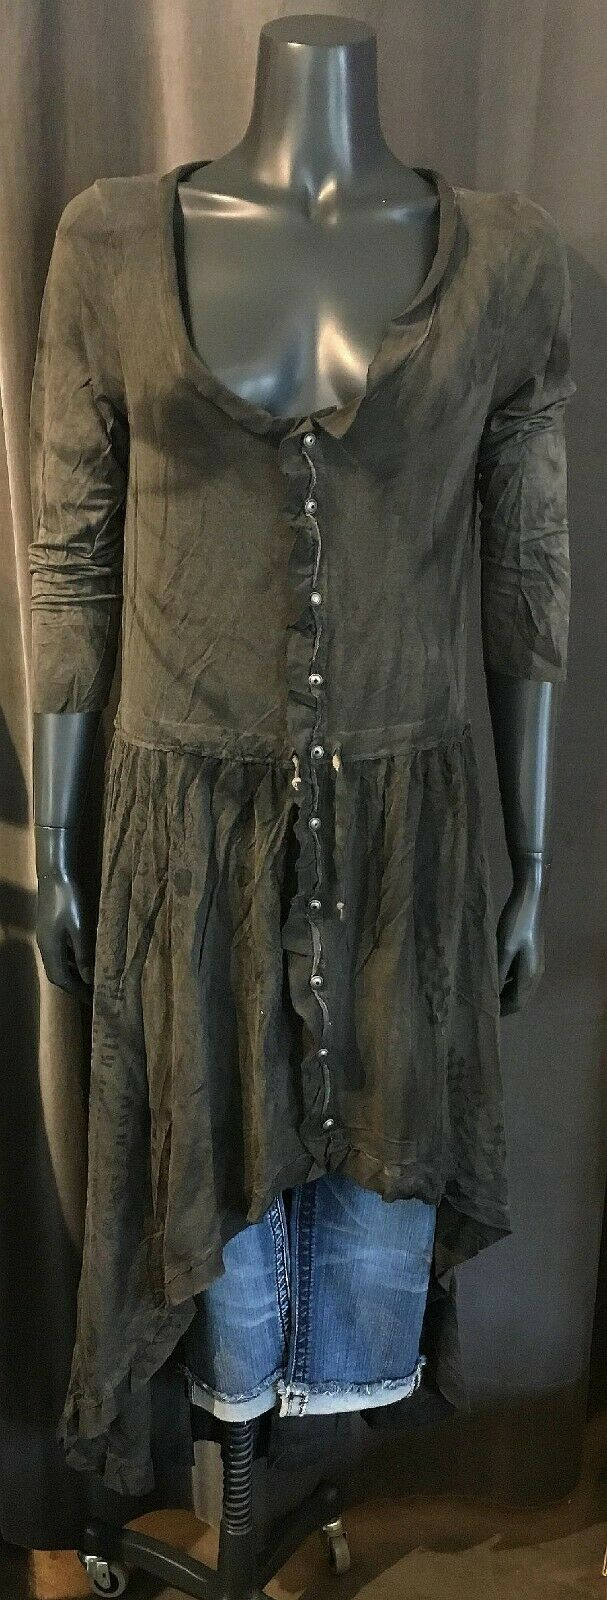 ORIGINAL RUDE RIDERS Damen  SHIRT Kleid  R03552 Rw109